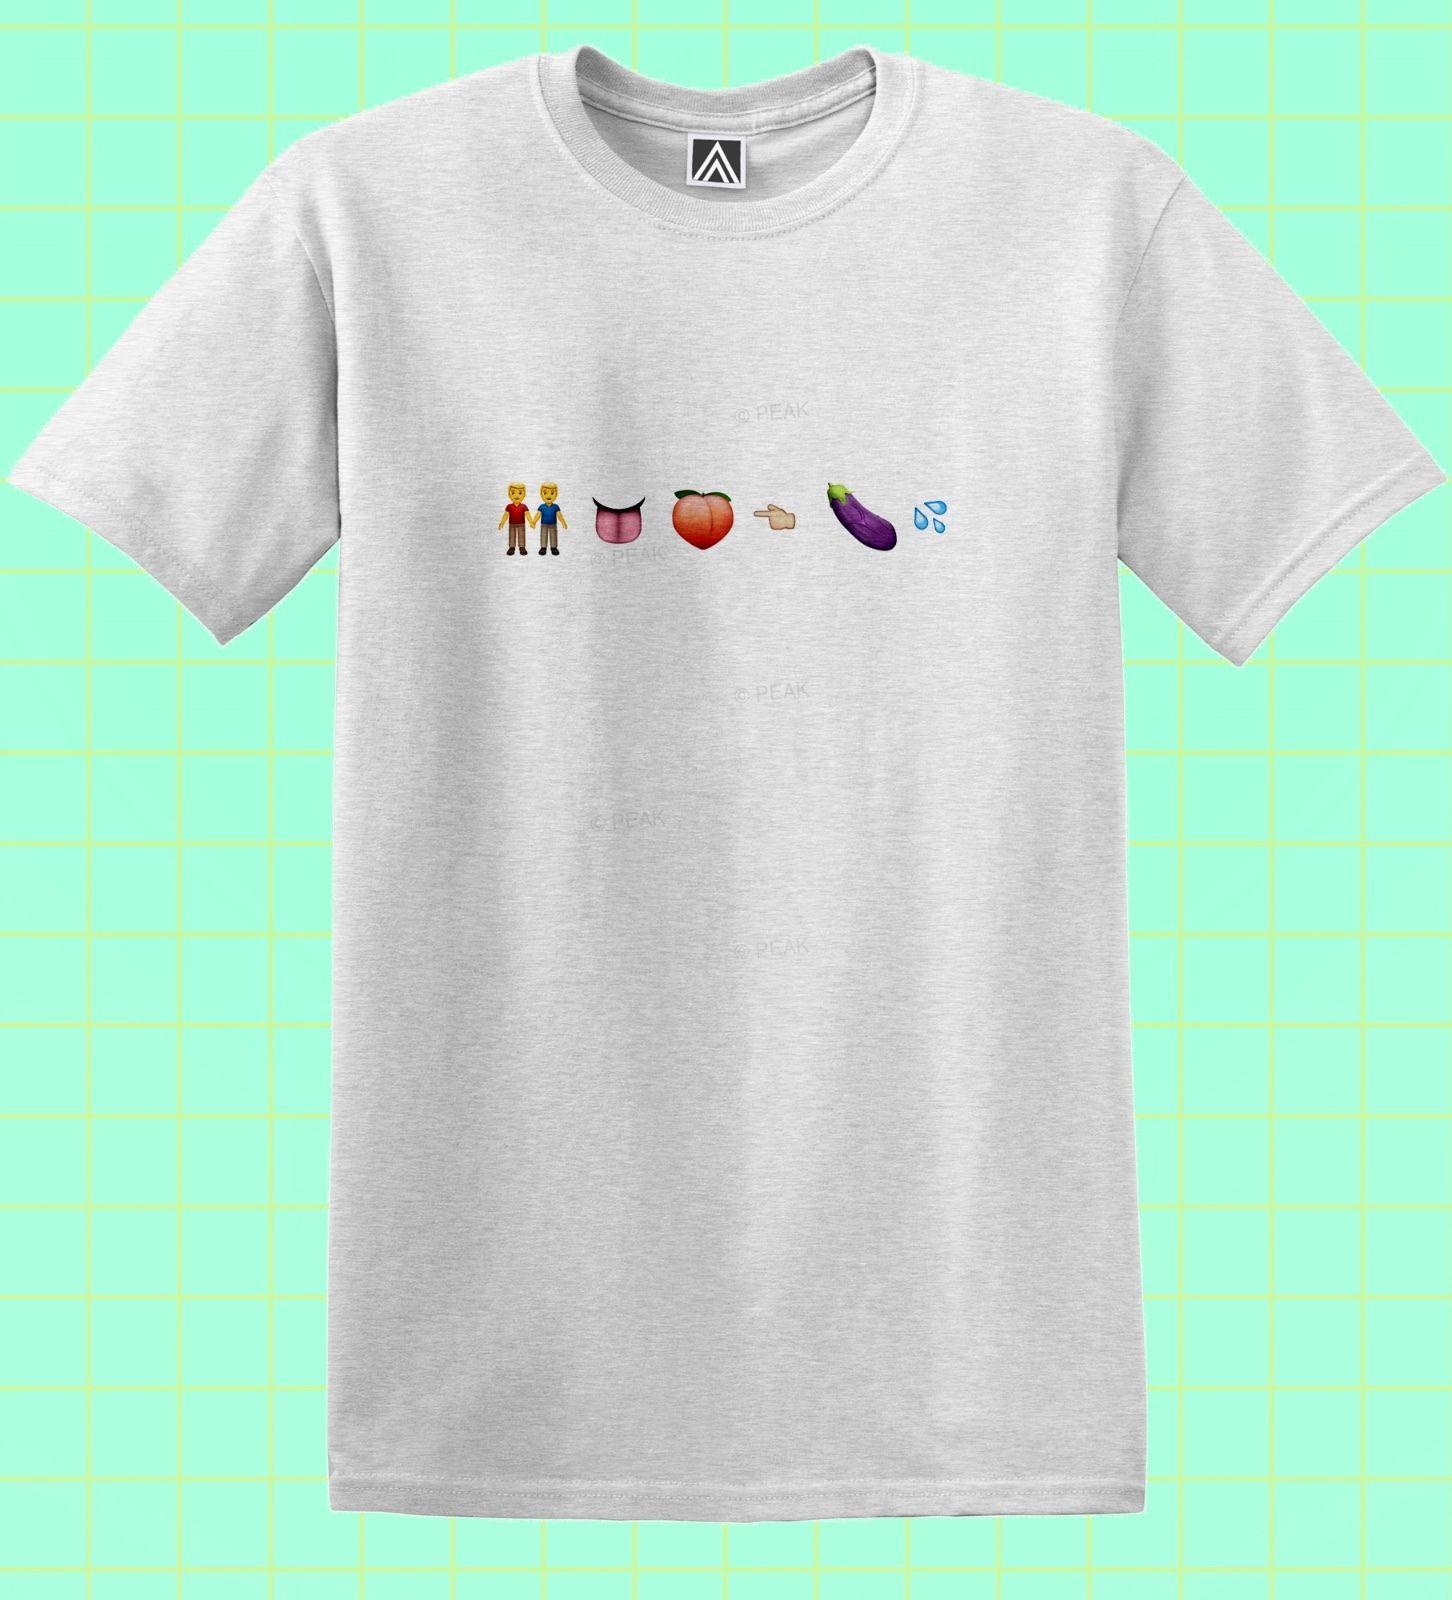 Compre Detalles Zu Gay Emoji Camiseta Pride Lgbt Tee Mardi Gras